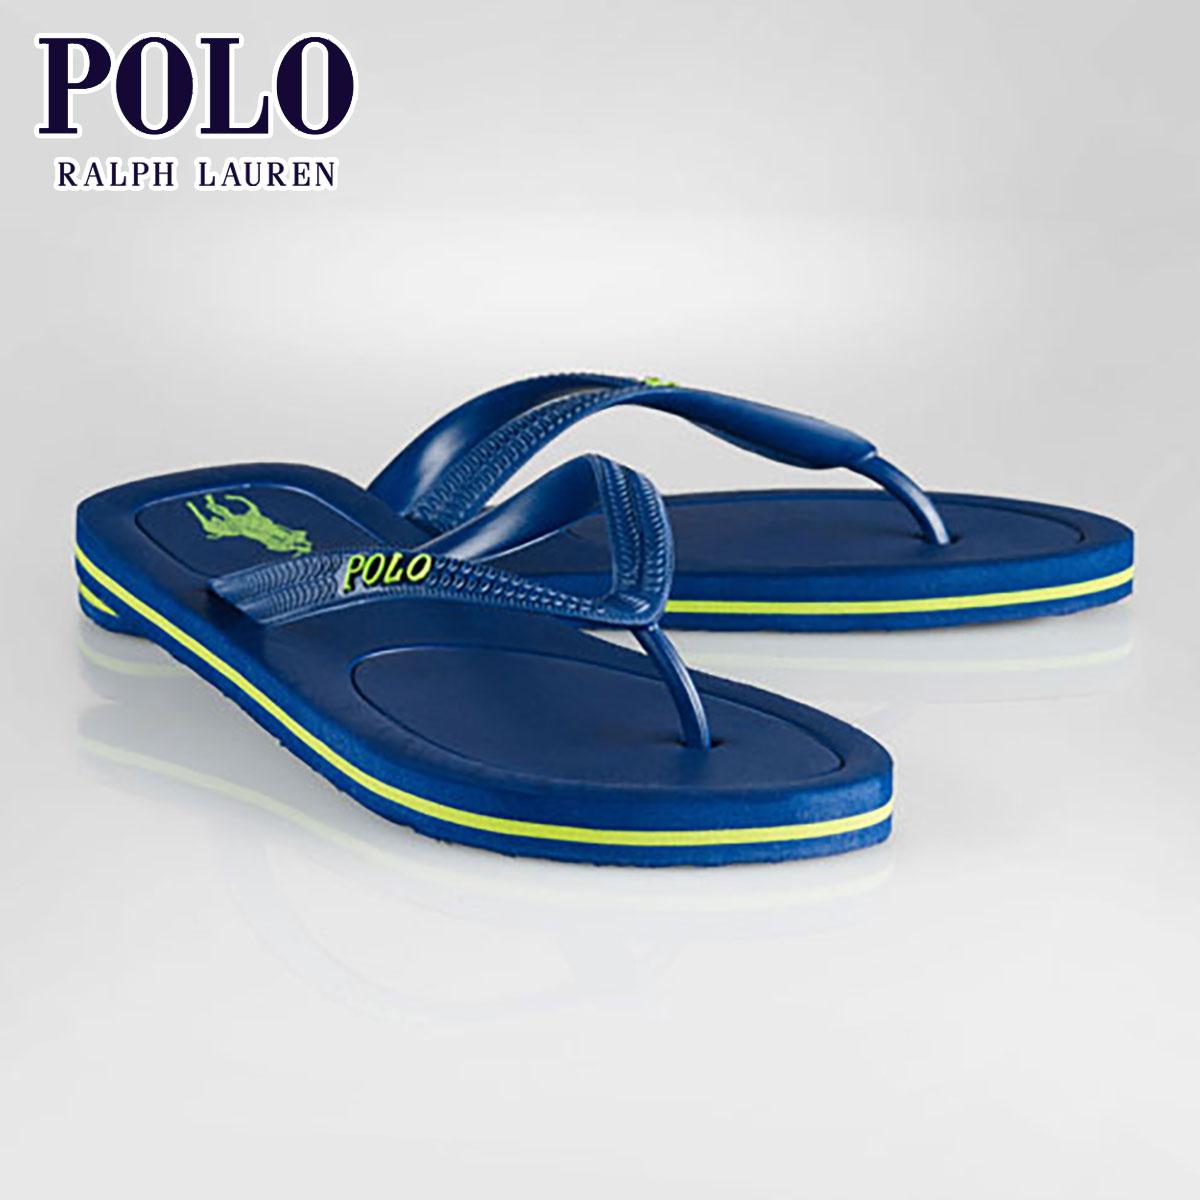 177a07224 Polo Ralph Lauren POLO RALPH LAUREN genuine Sandals HALESOWEN FLIP-FLOP